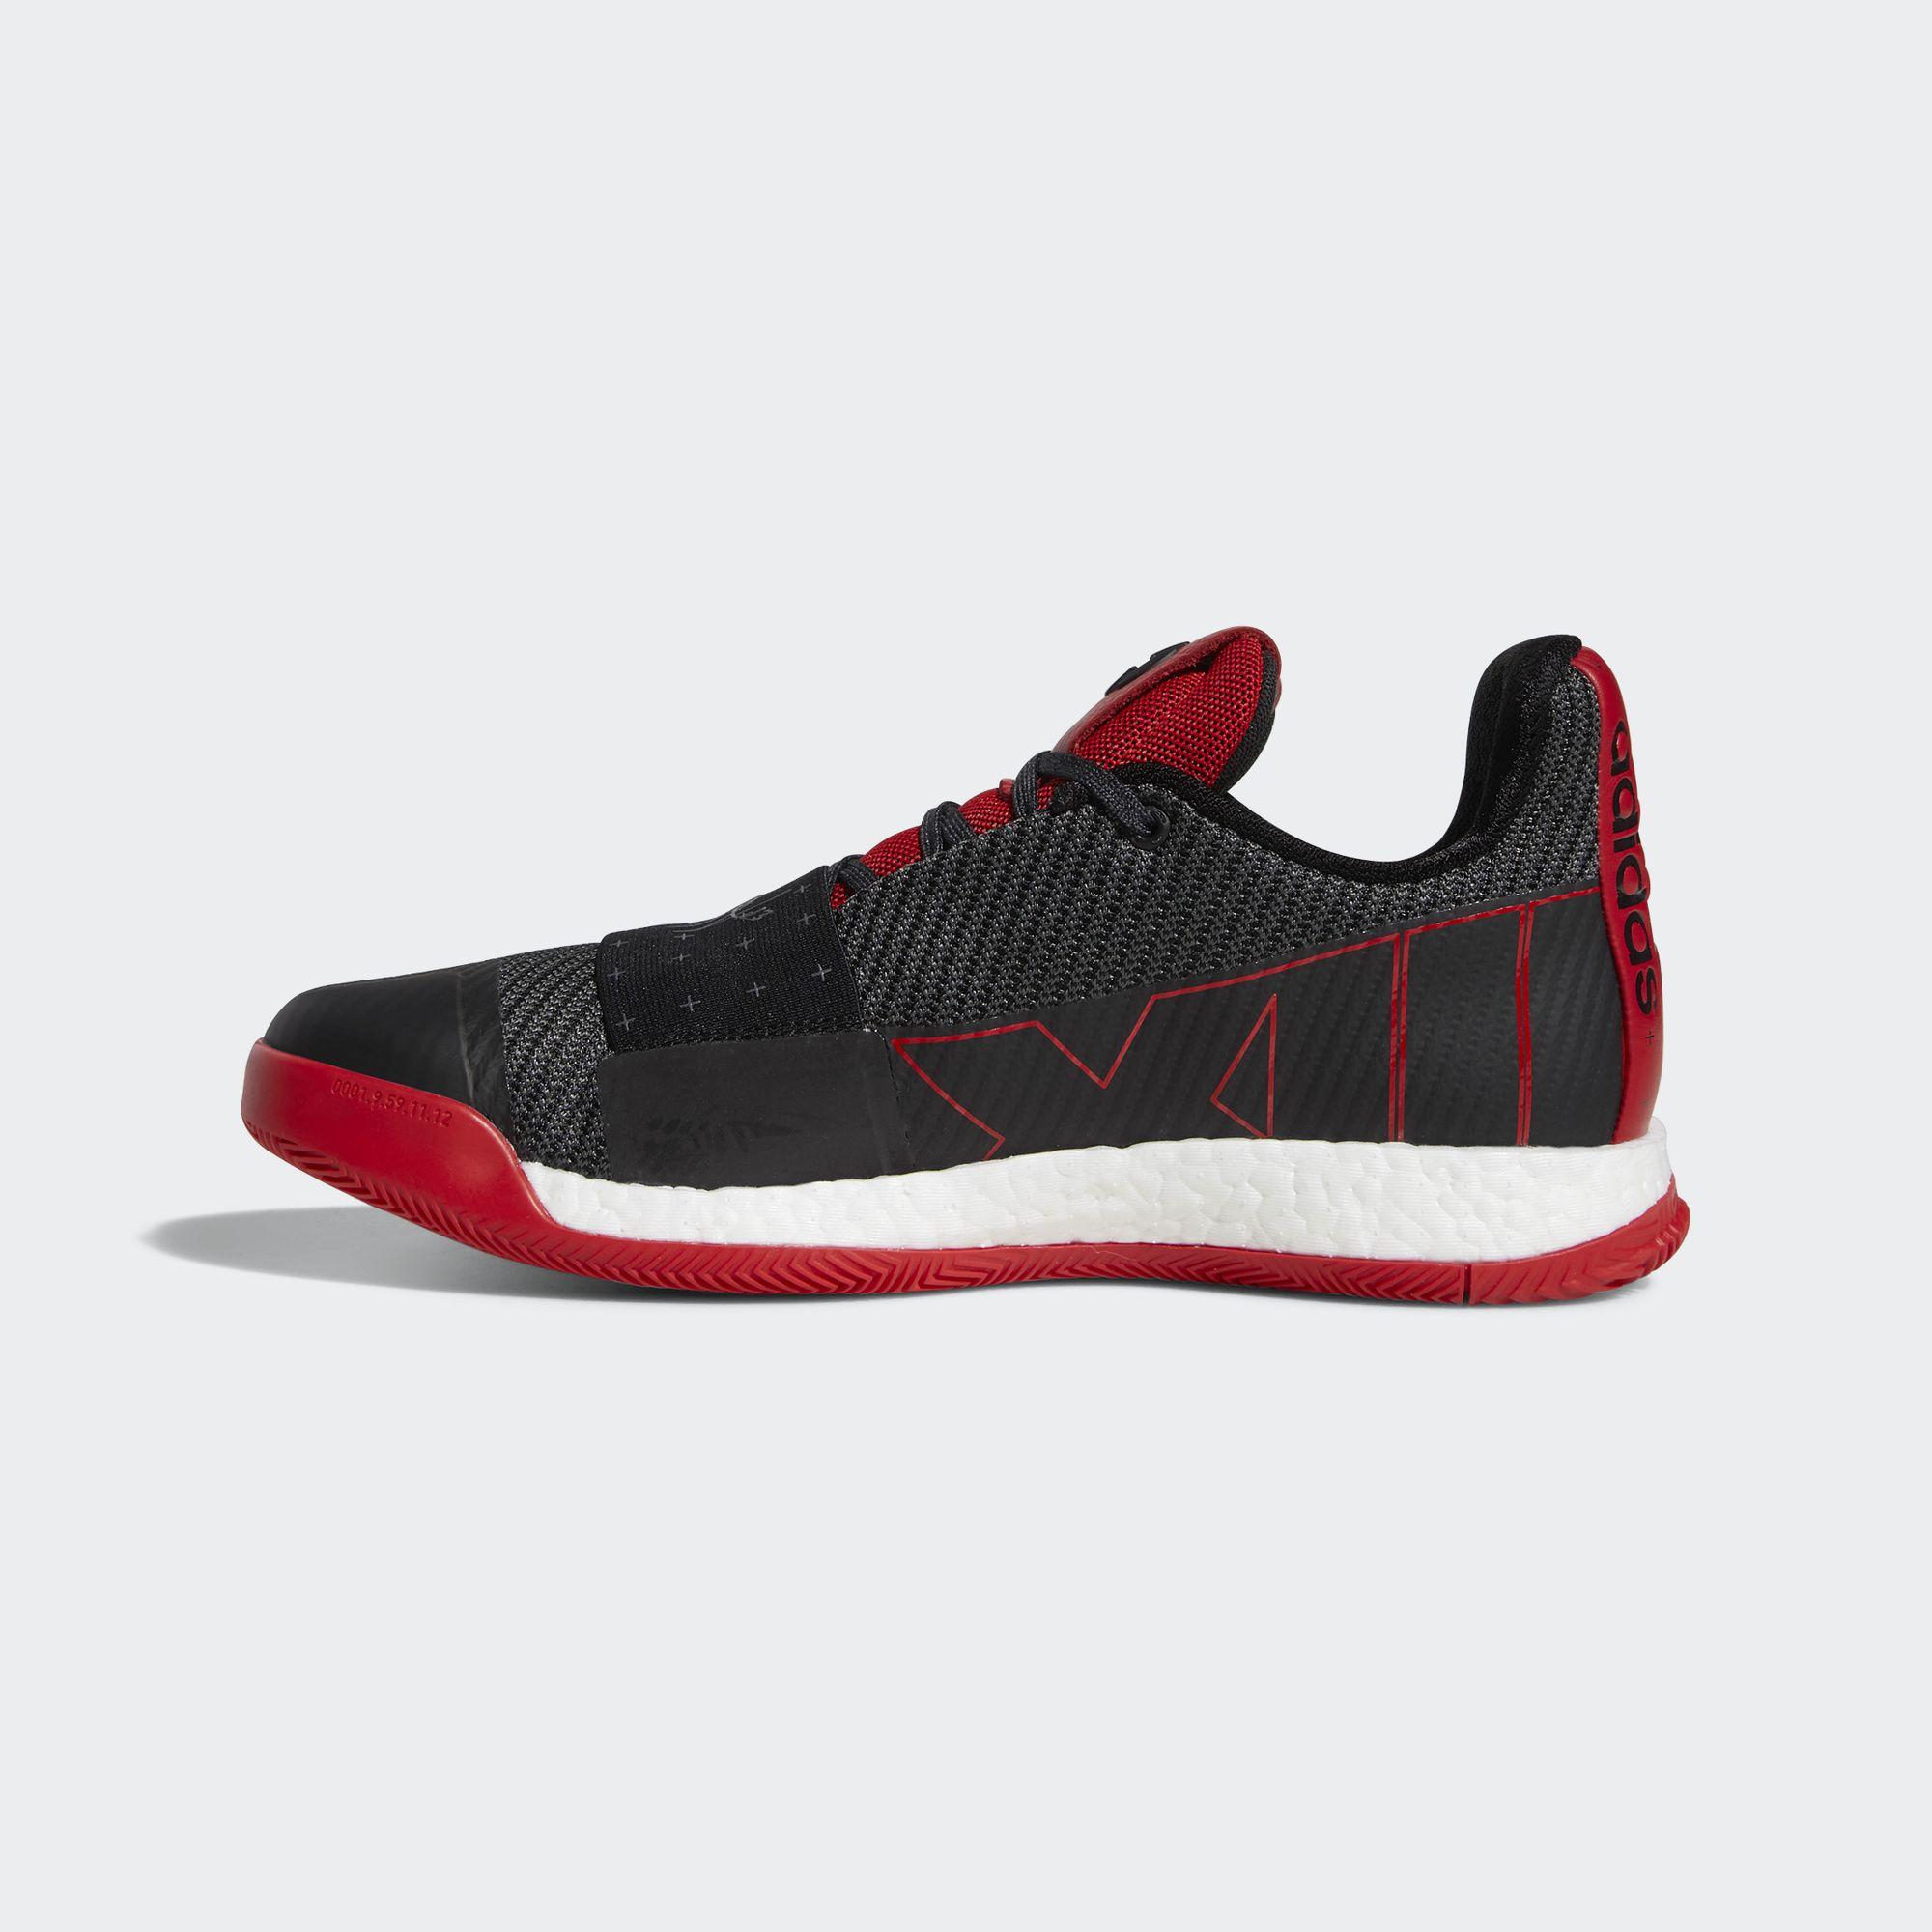 adidas harden vol 3 black red 1